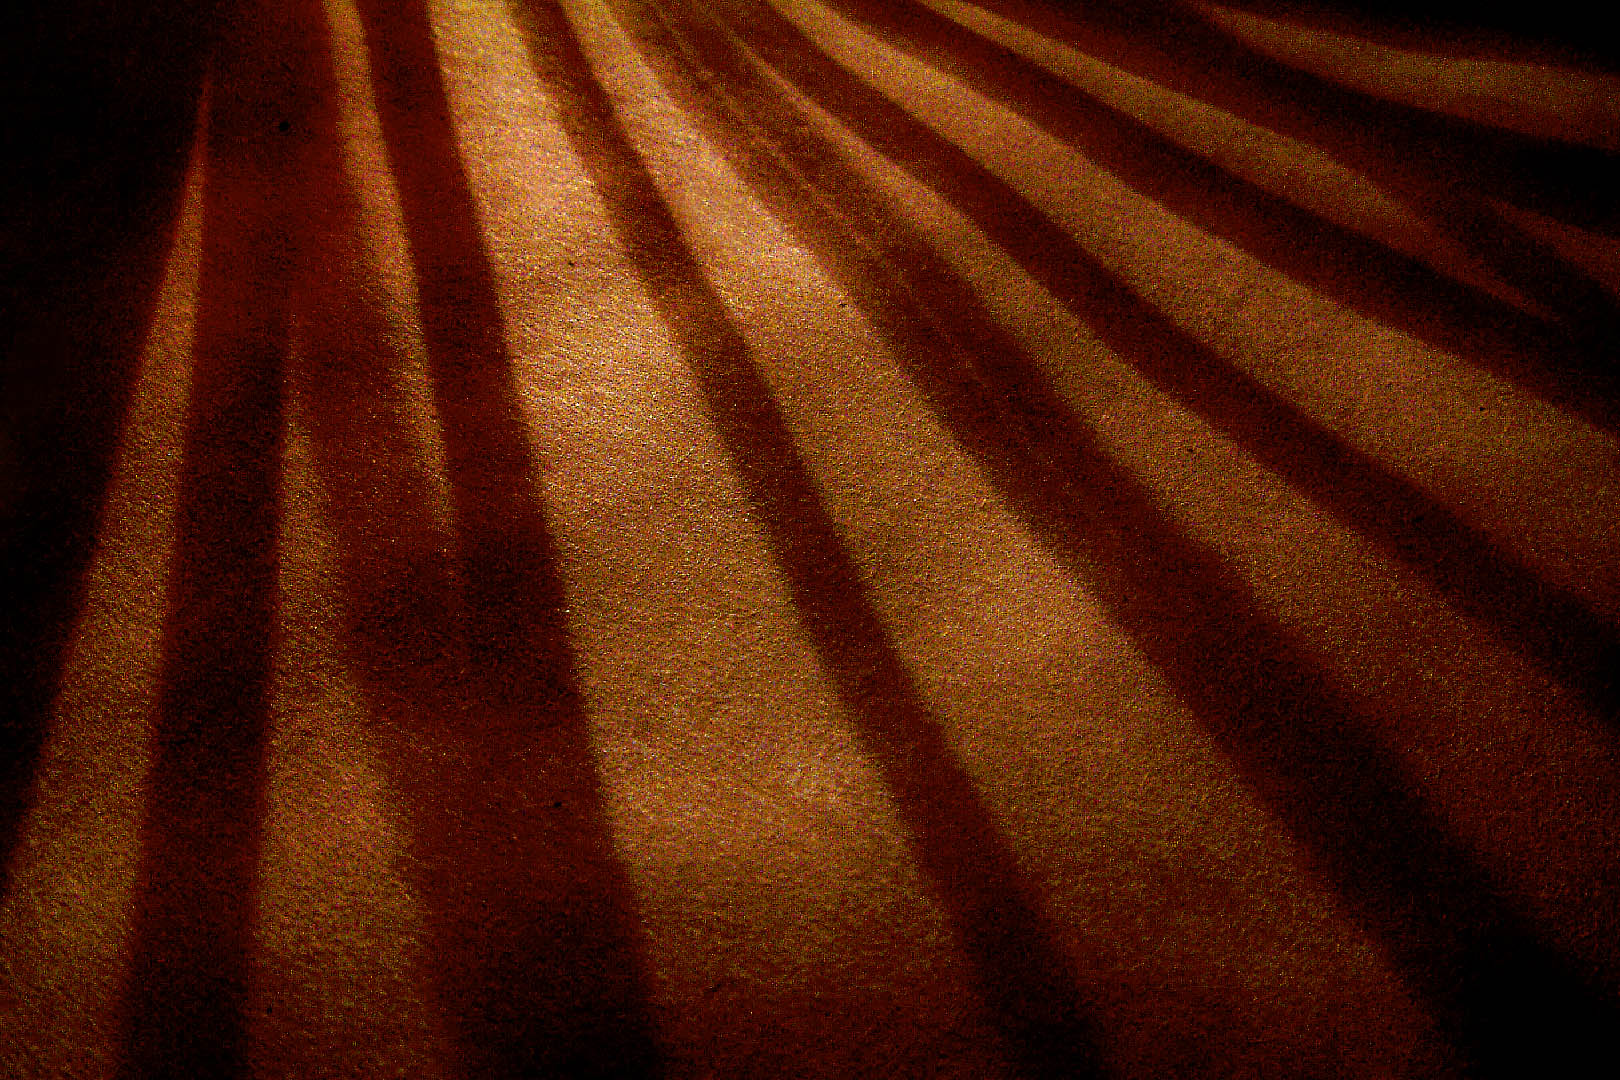 Slinky Shadow